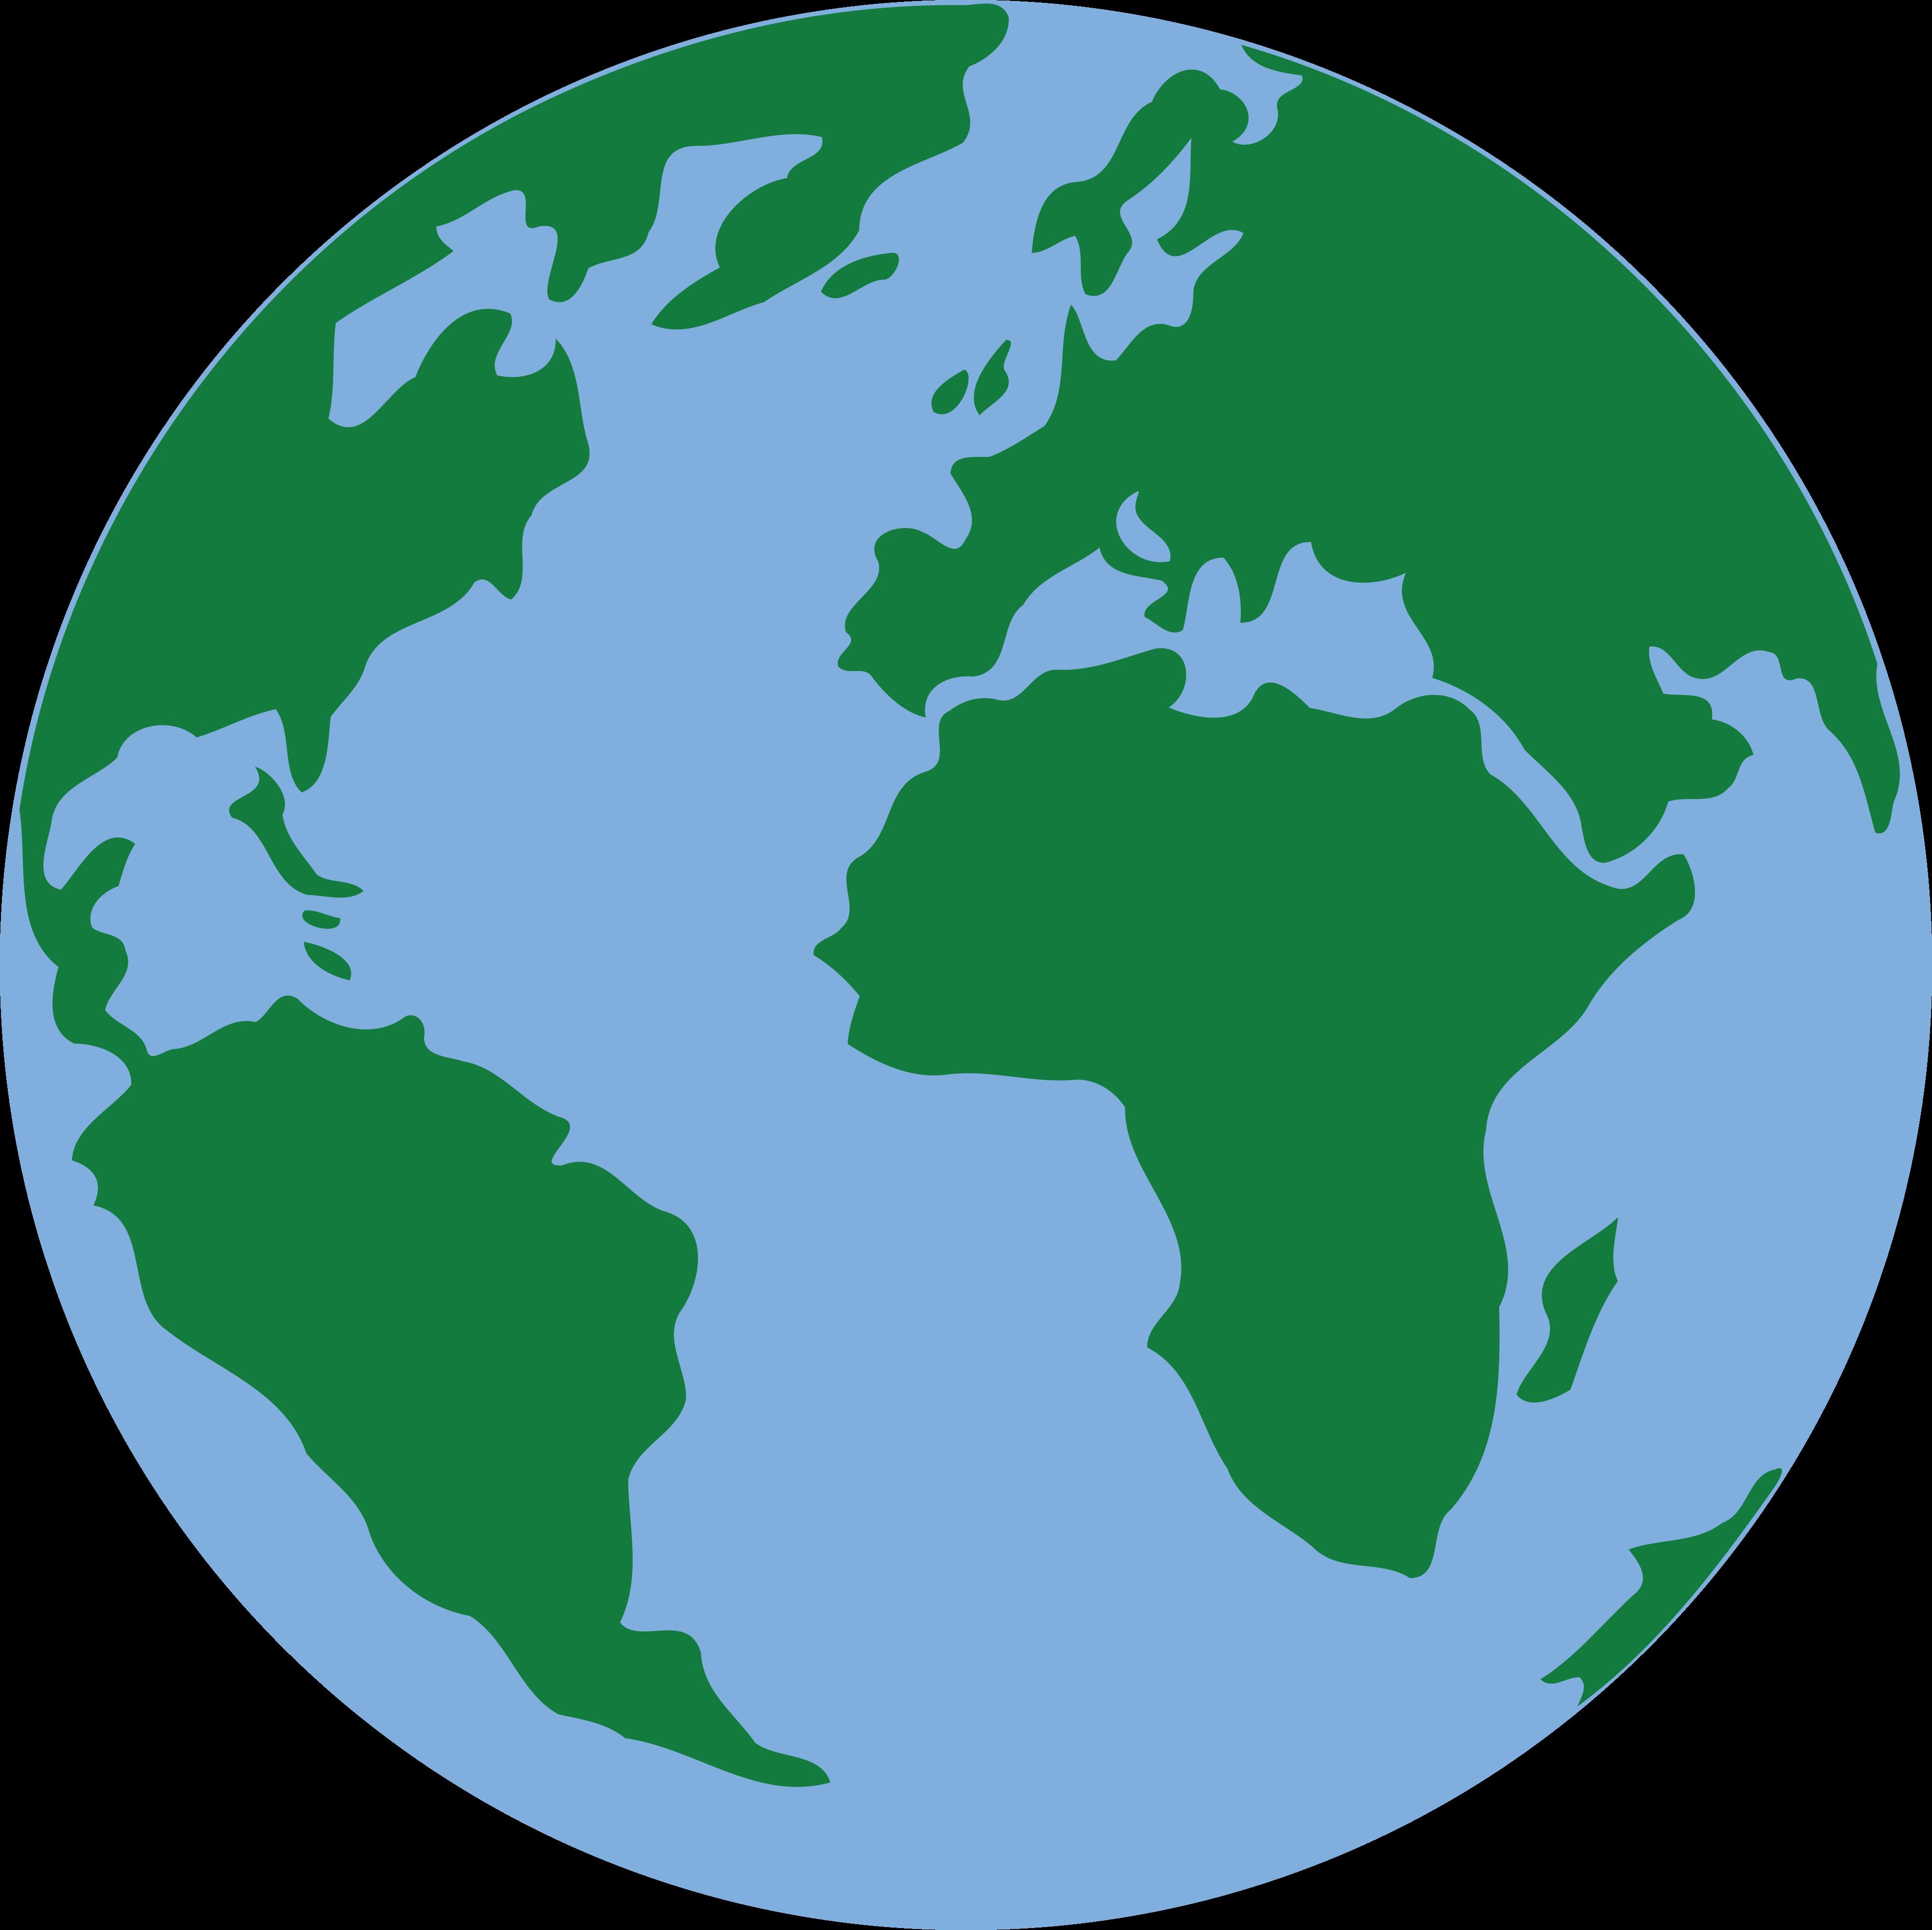 Globe green planet transprent. Clipart earth clip art